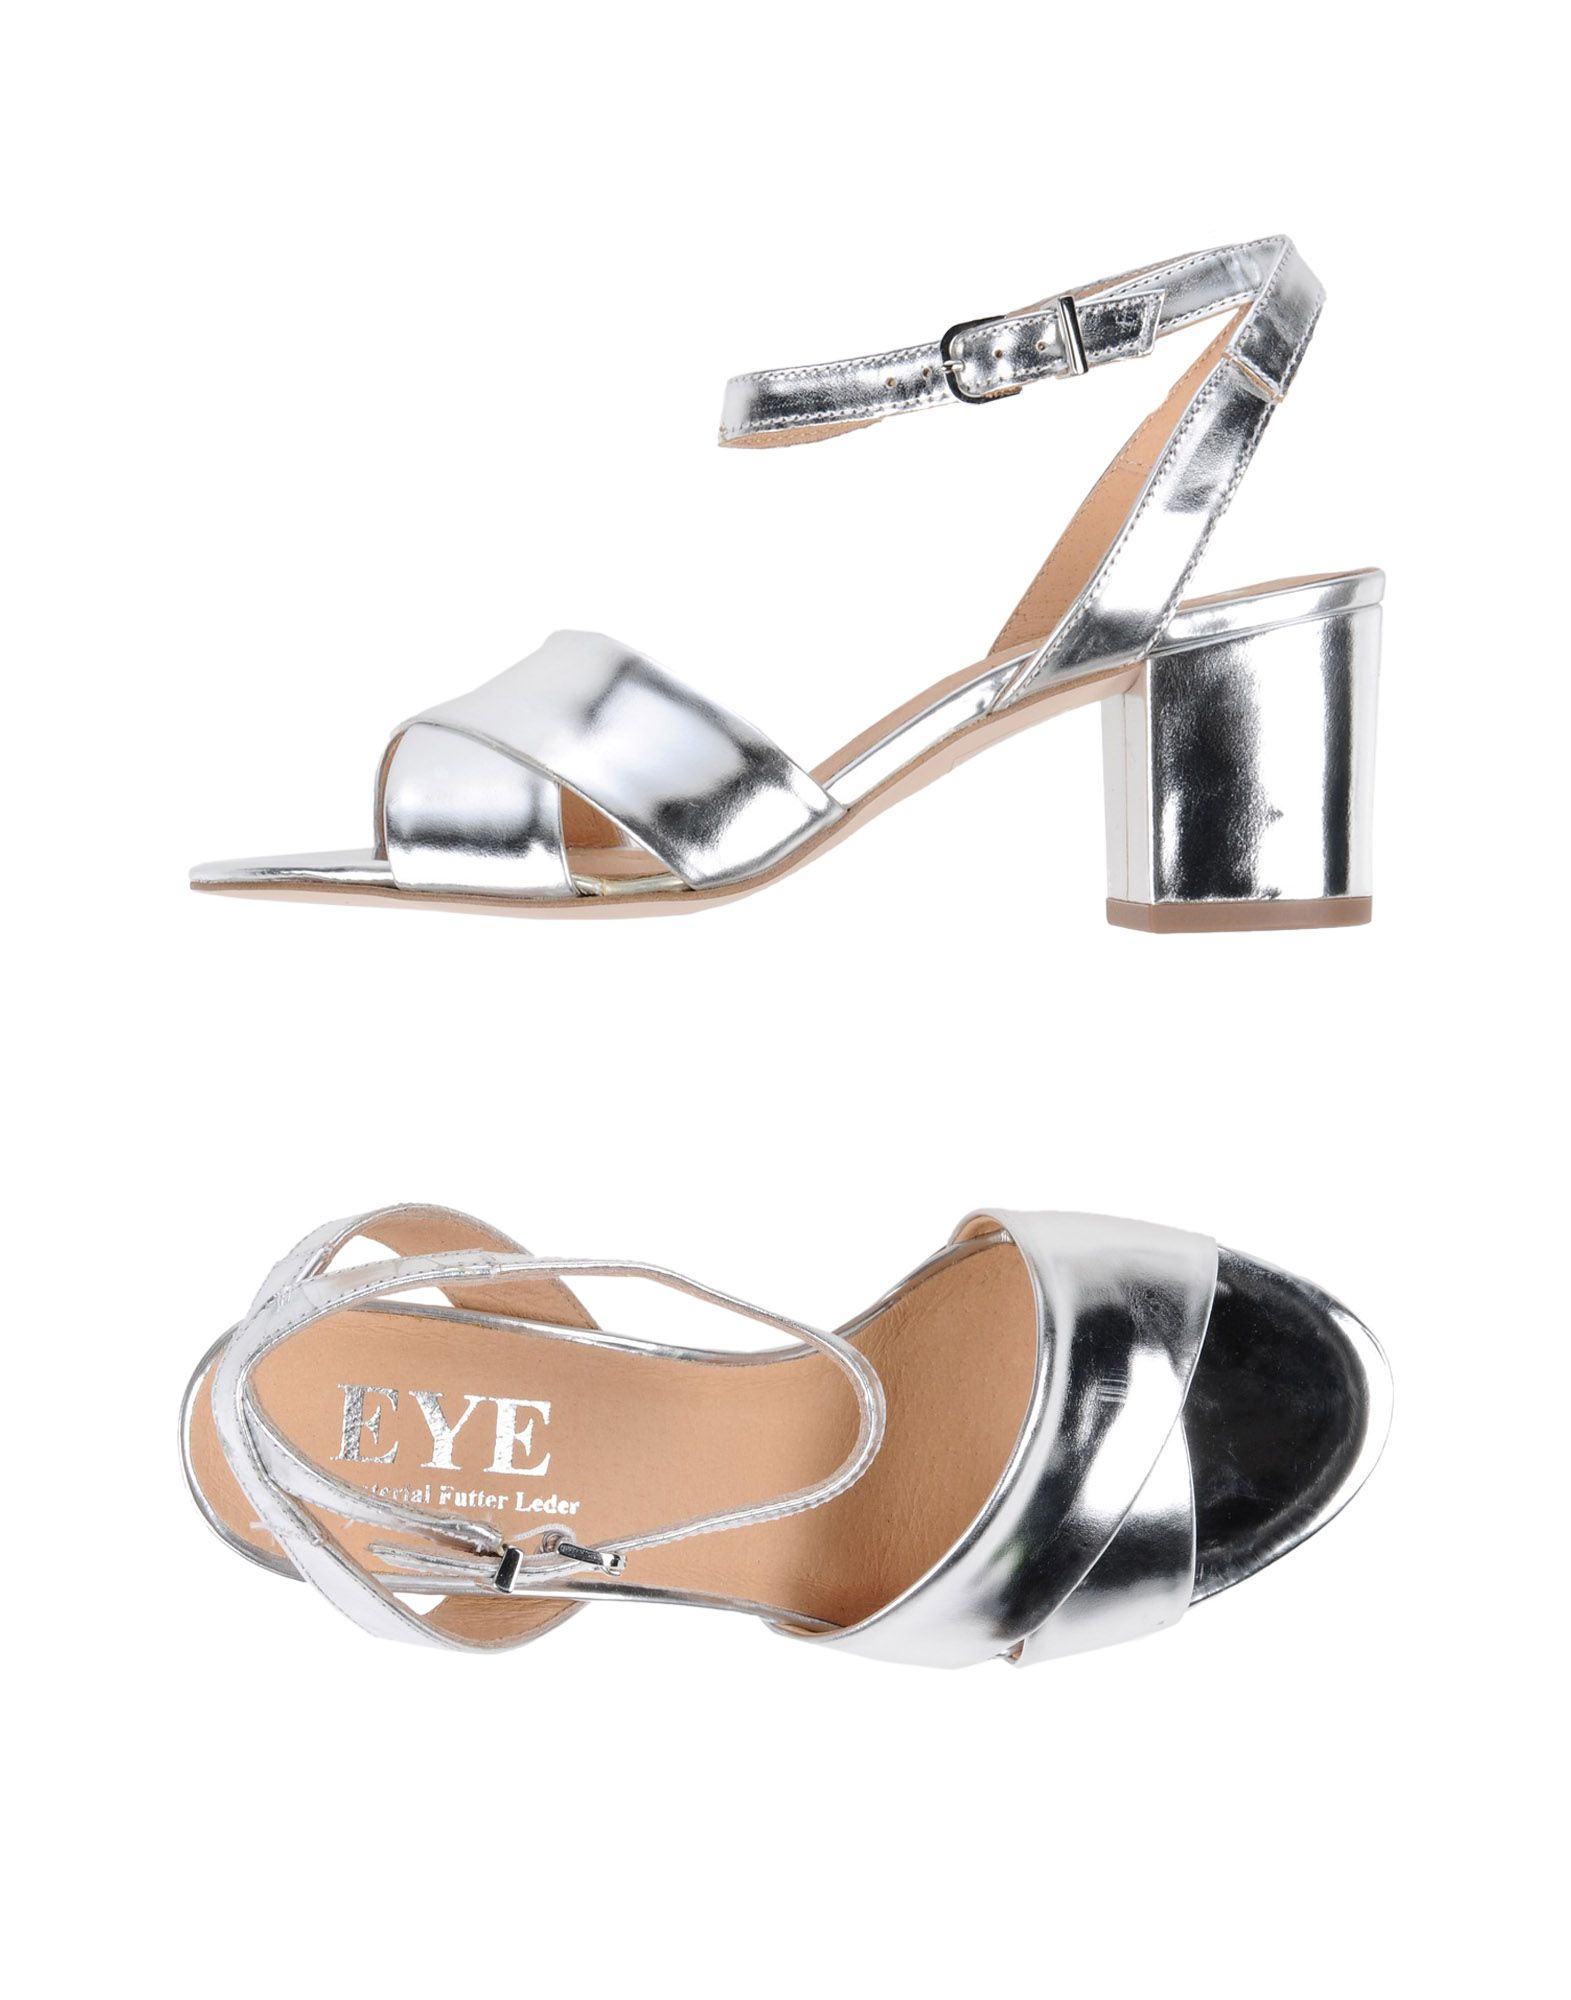 Eye Sandalen Damen  11427484RO Gute Qualität beliebte Schuhe